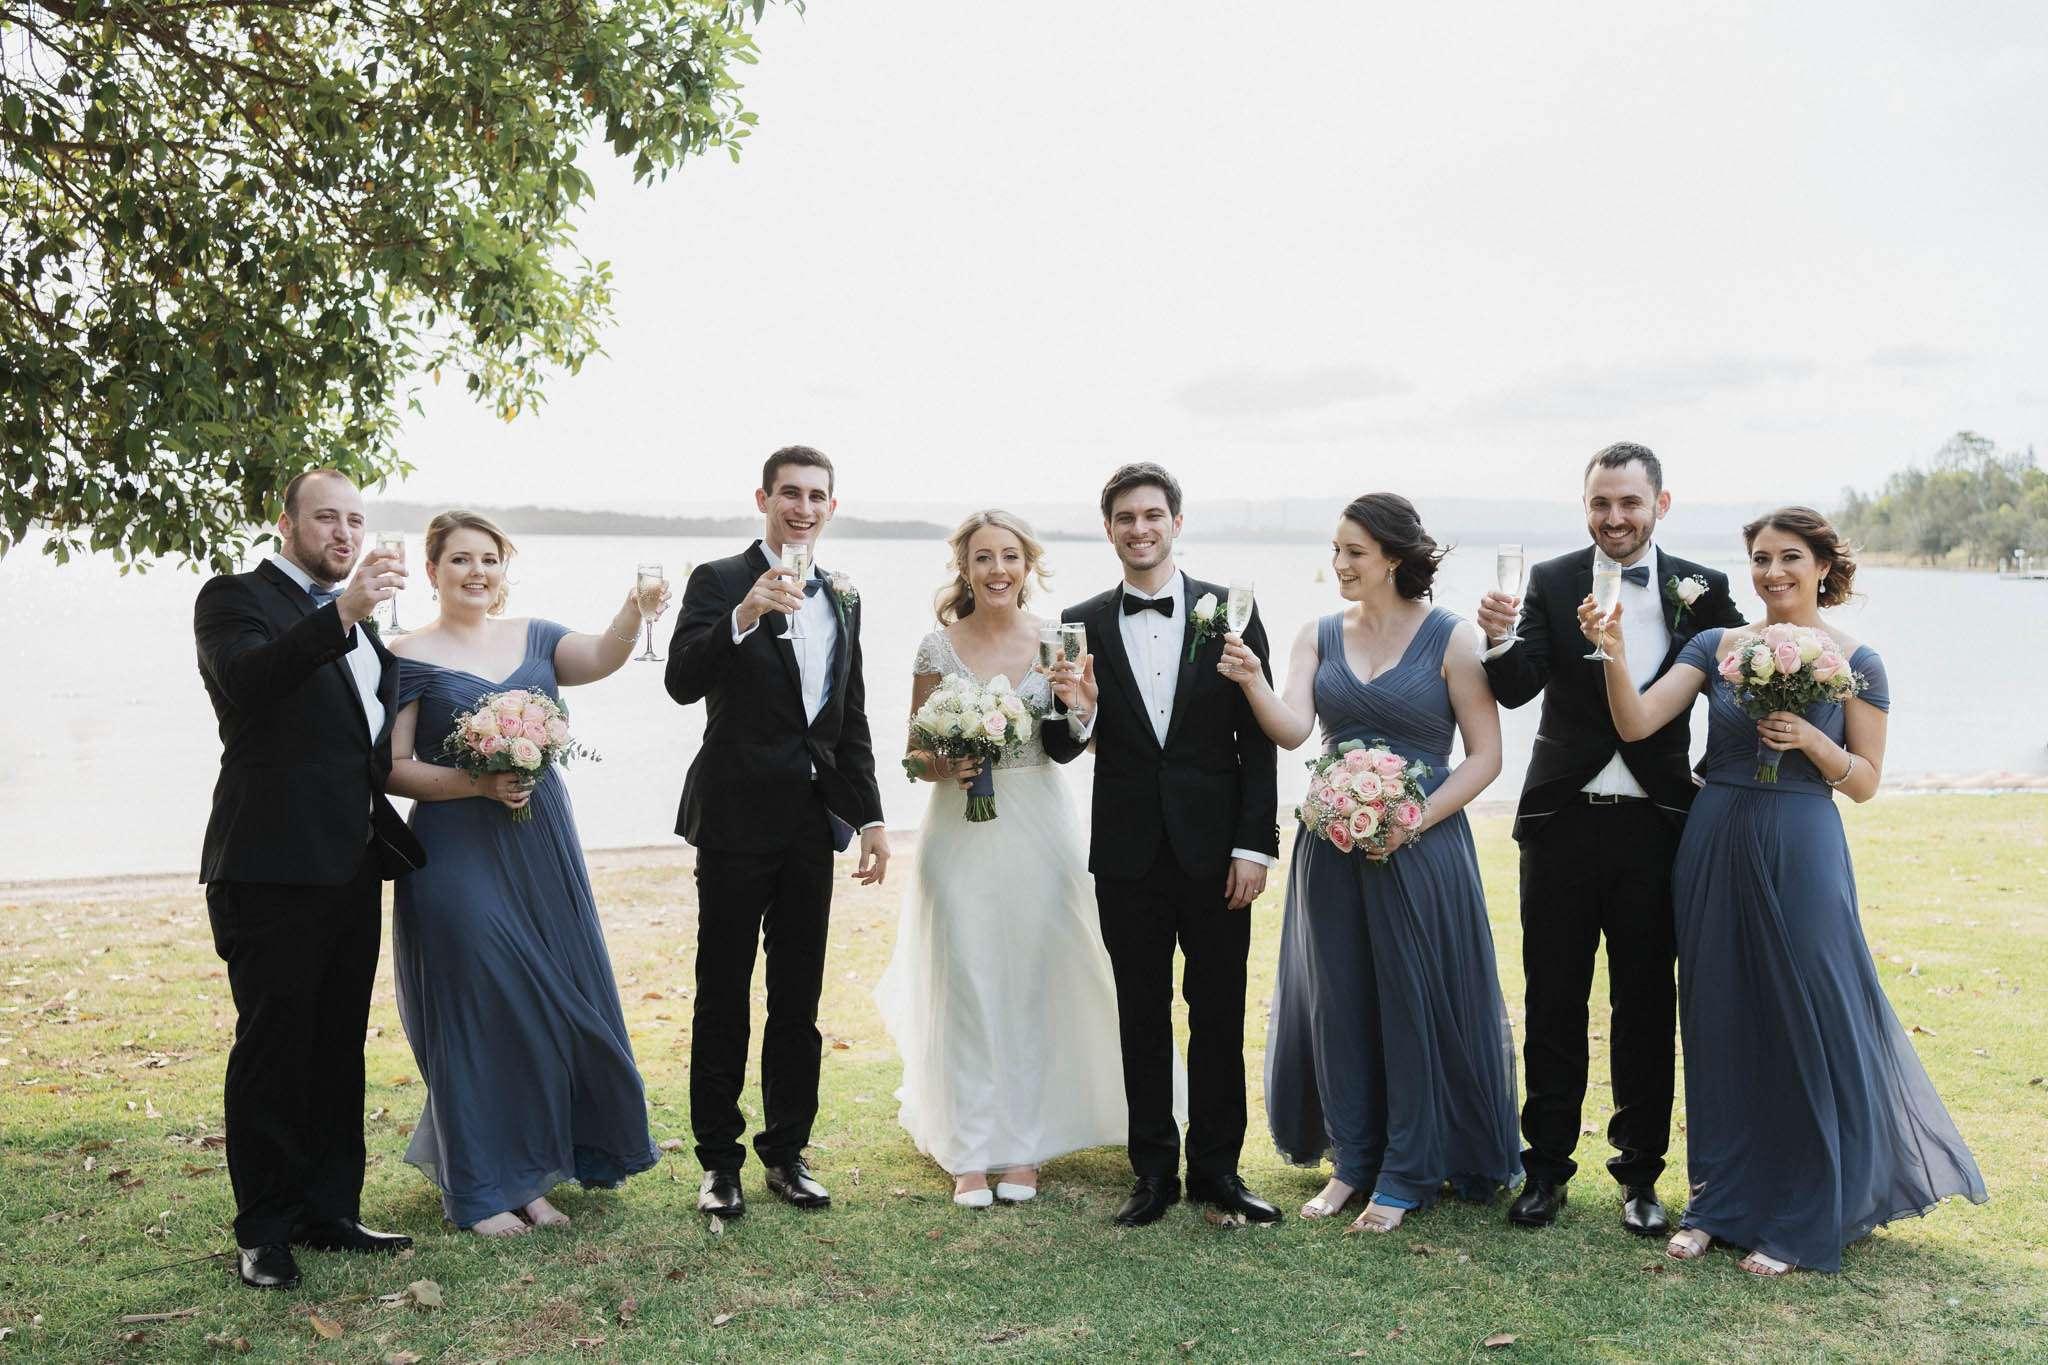 A fun wedding at Raffertys Resort Lake Macquarie